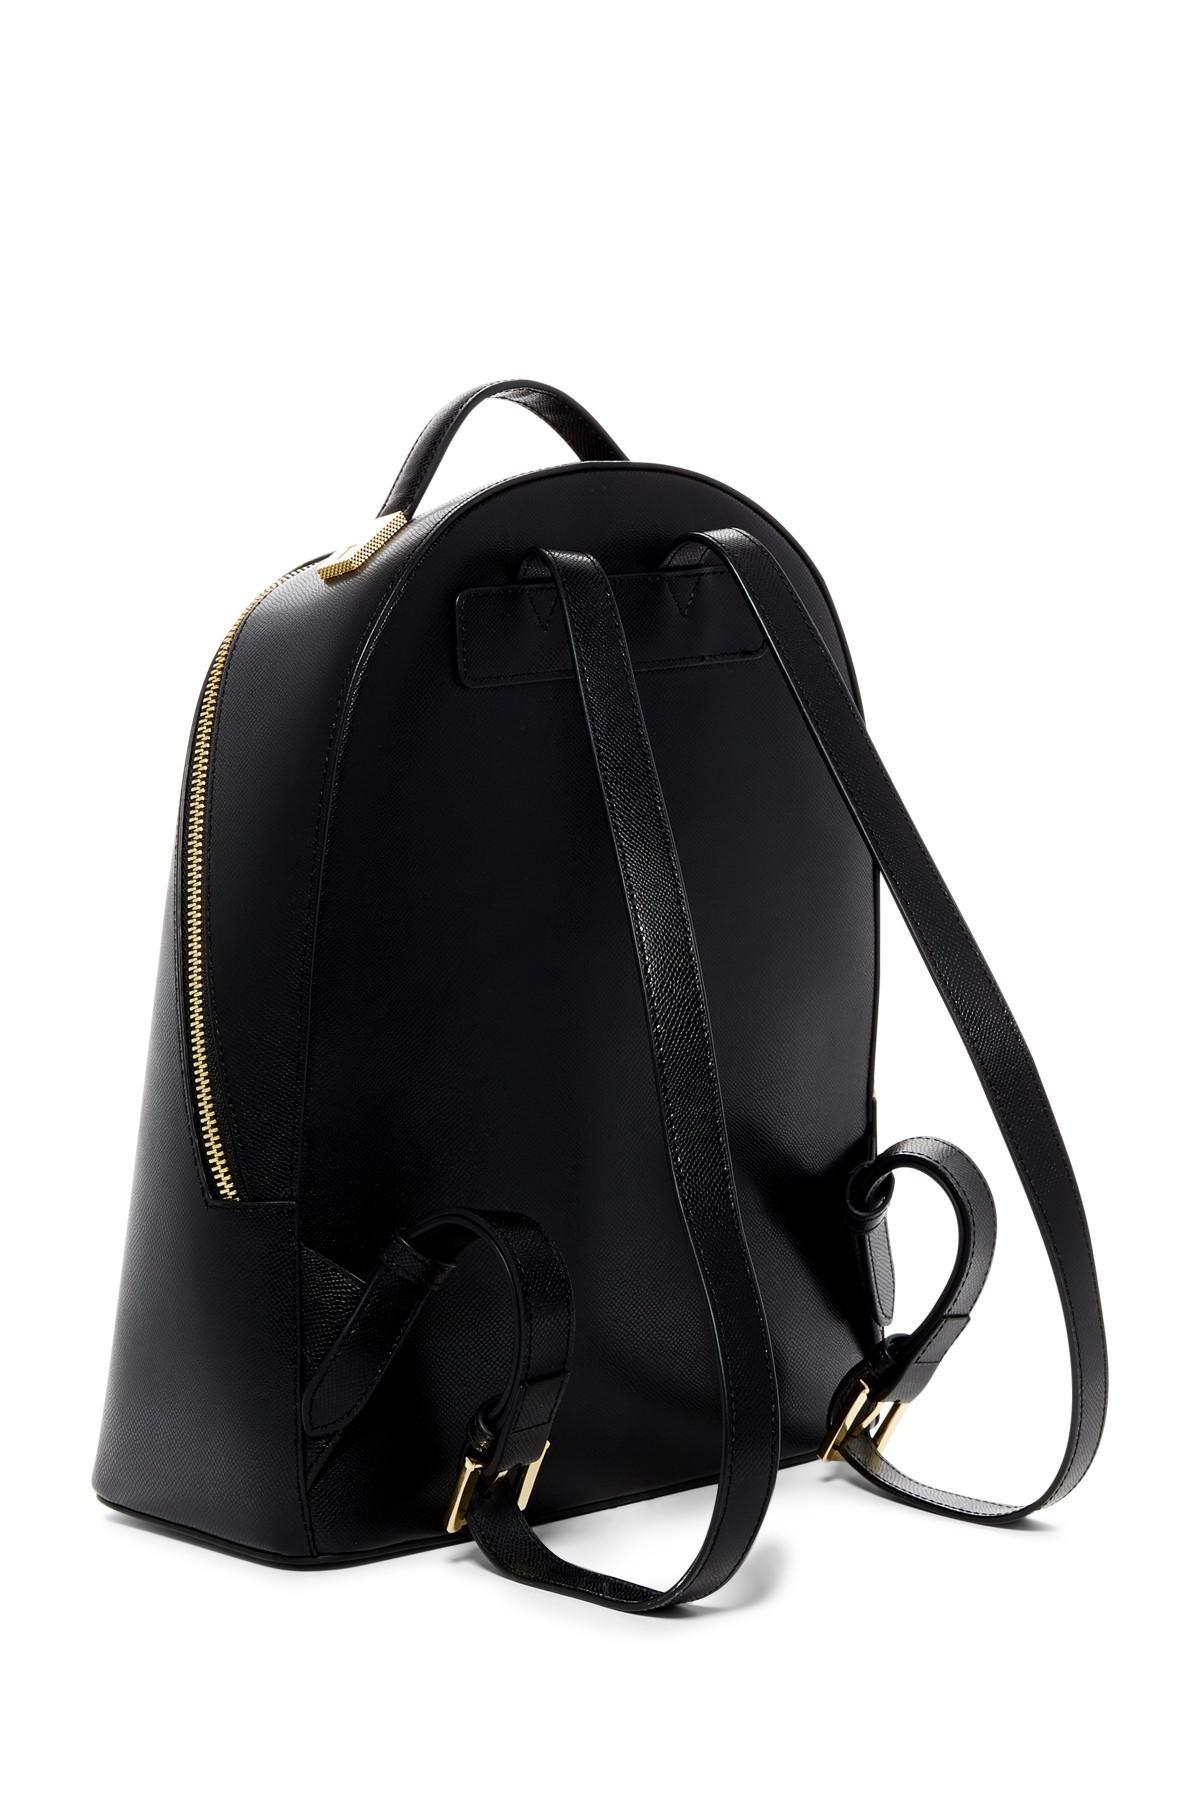 b7c17108e Lyst - Ted Baker Jarvis Mini Grain Leather Backpack in Black